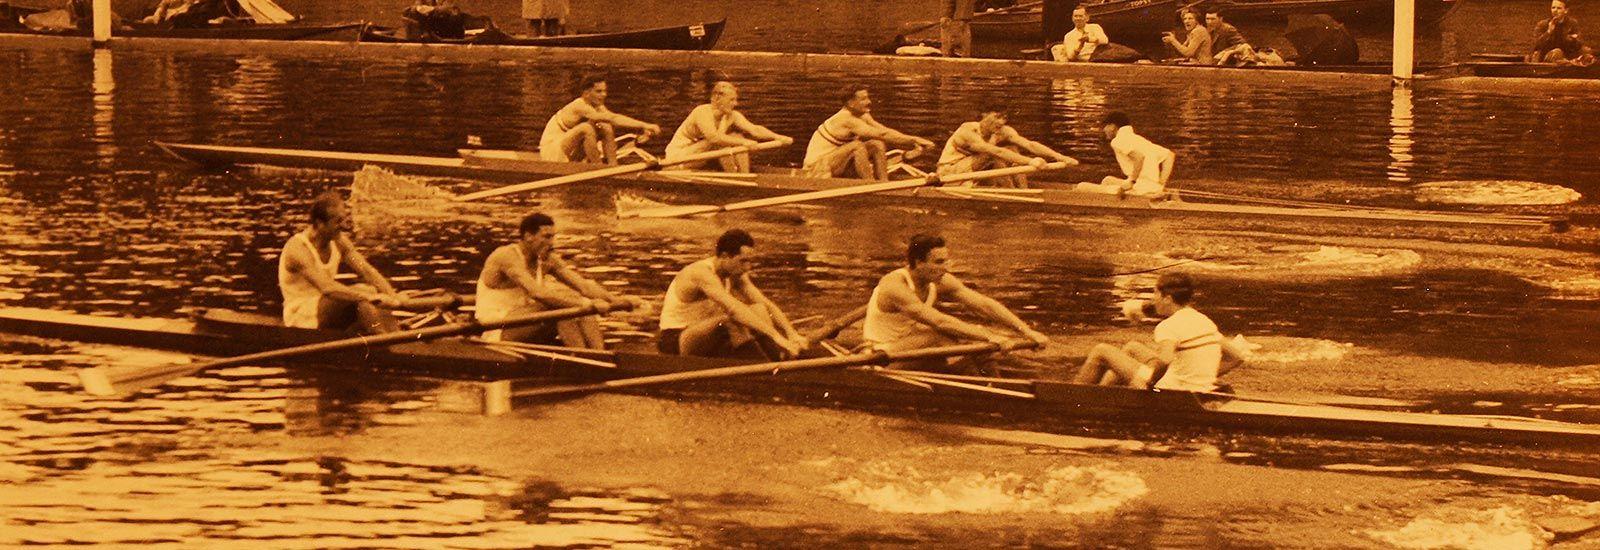 1948 Olympics British Coxed IV